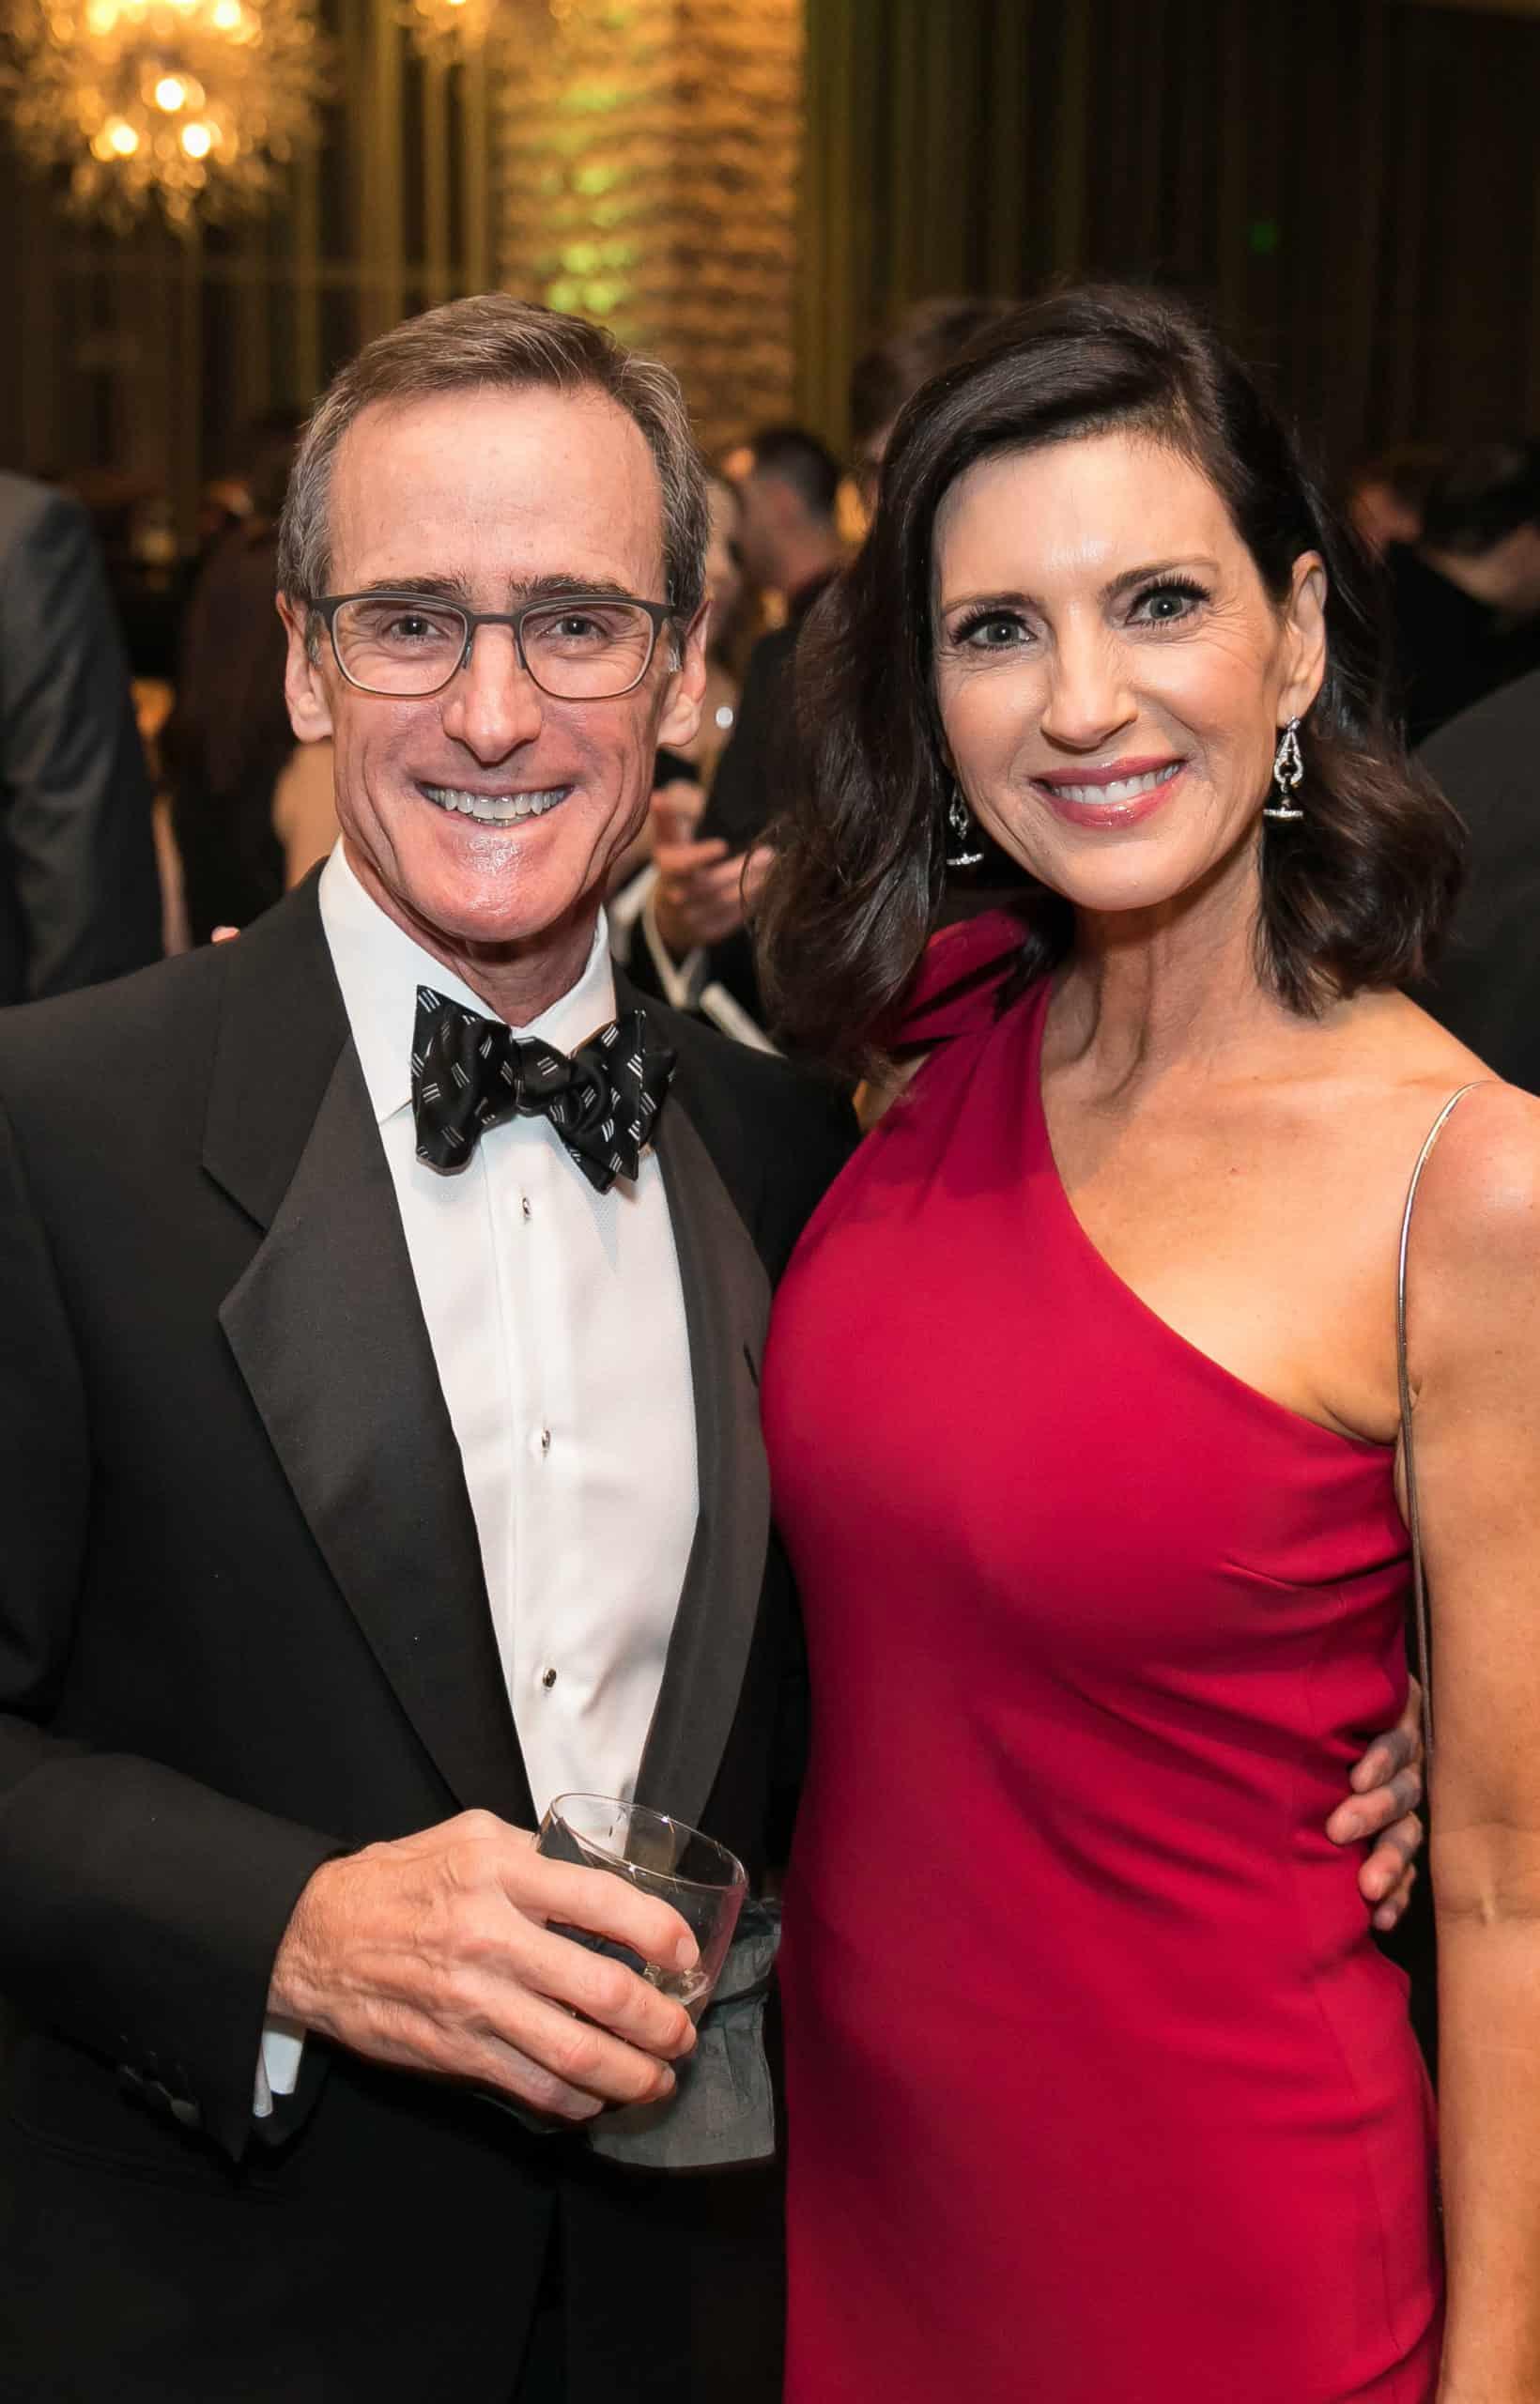 Angela and Pierre Filardi